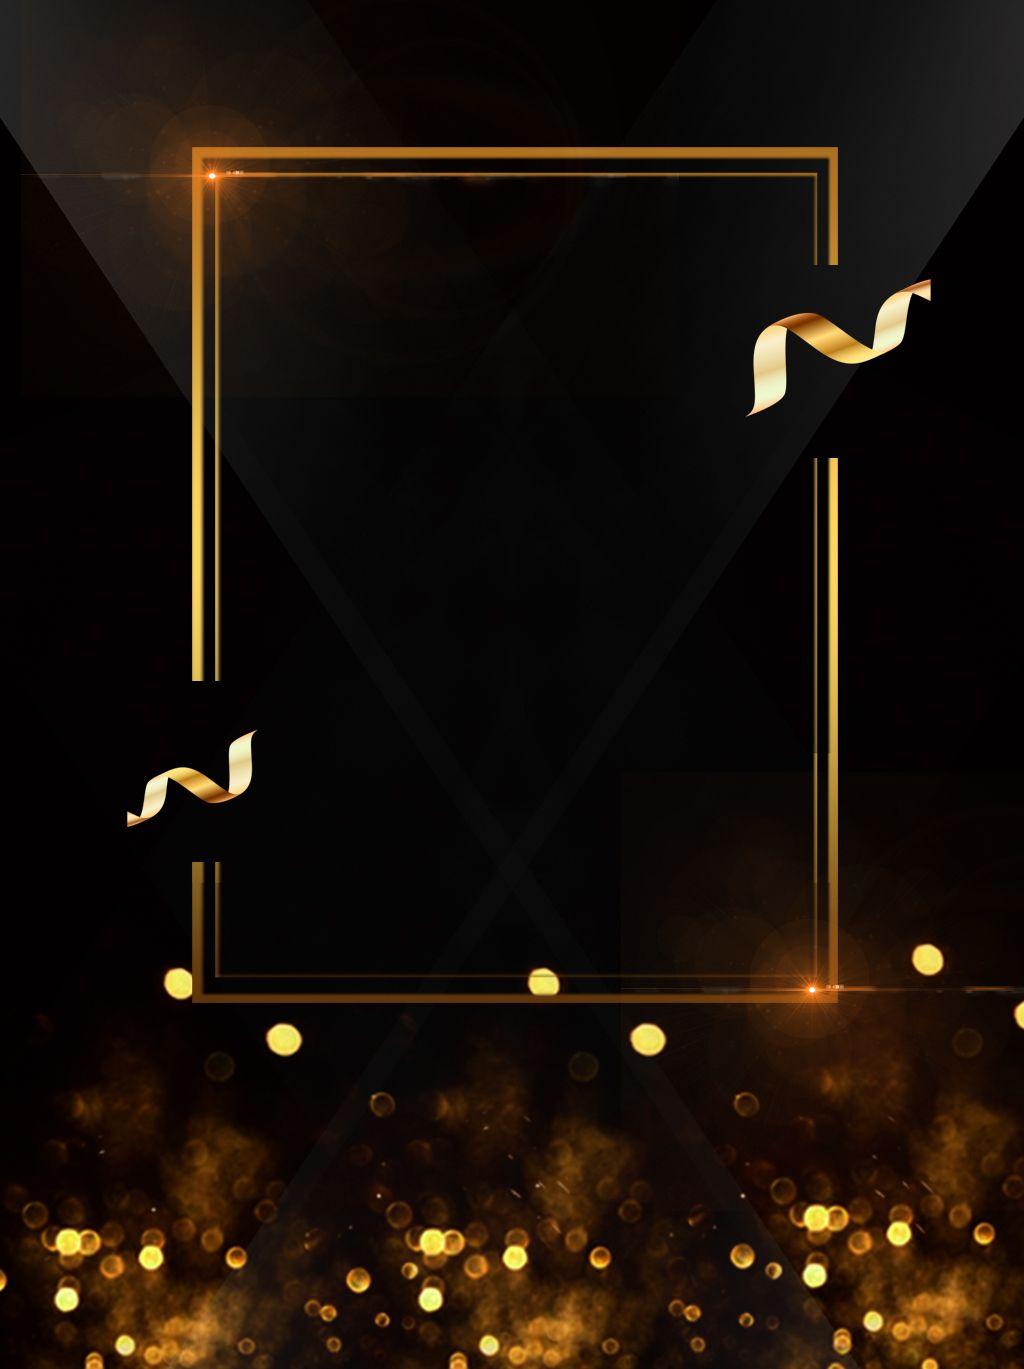 Black Gold Wind Creative Background Design Creative Background Black Background Design Poster Background Design